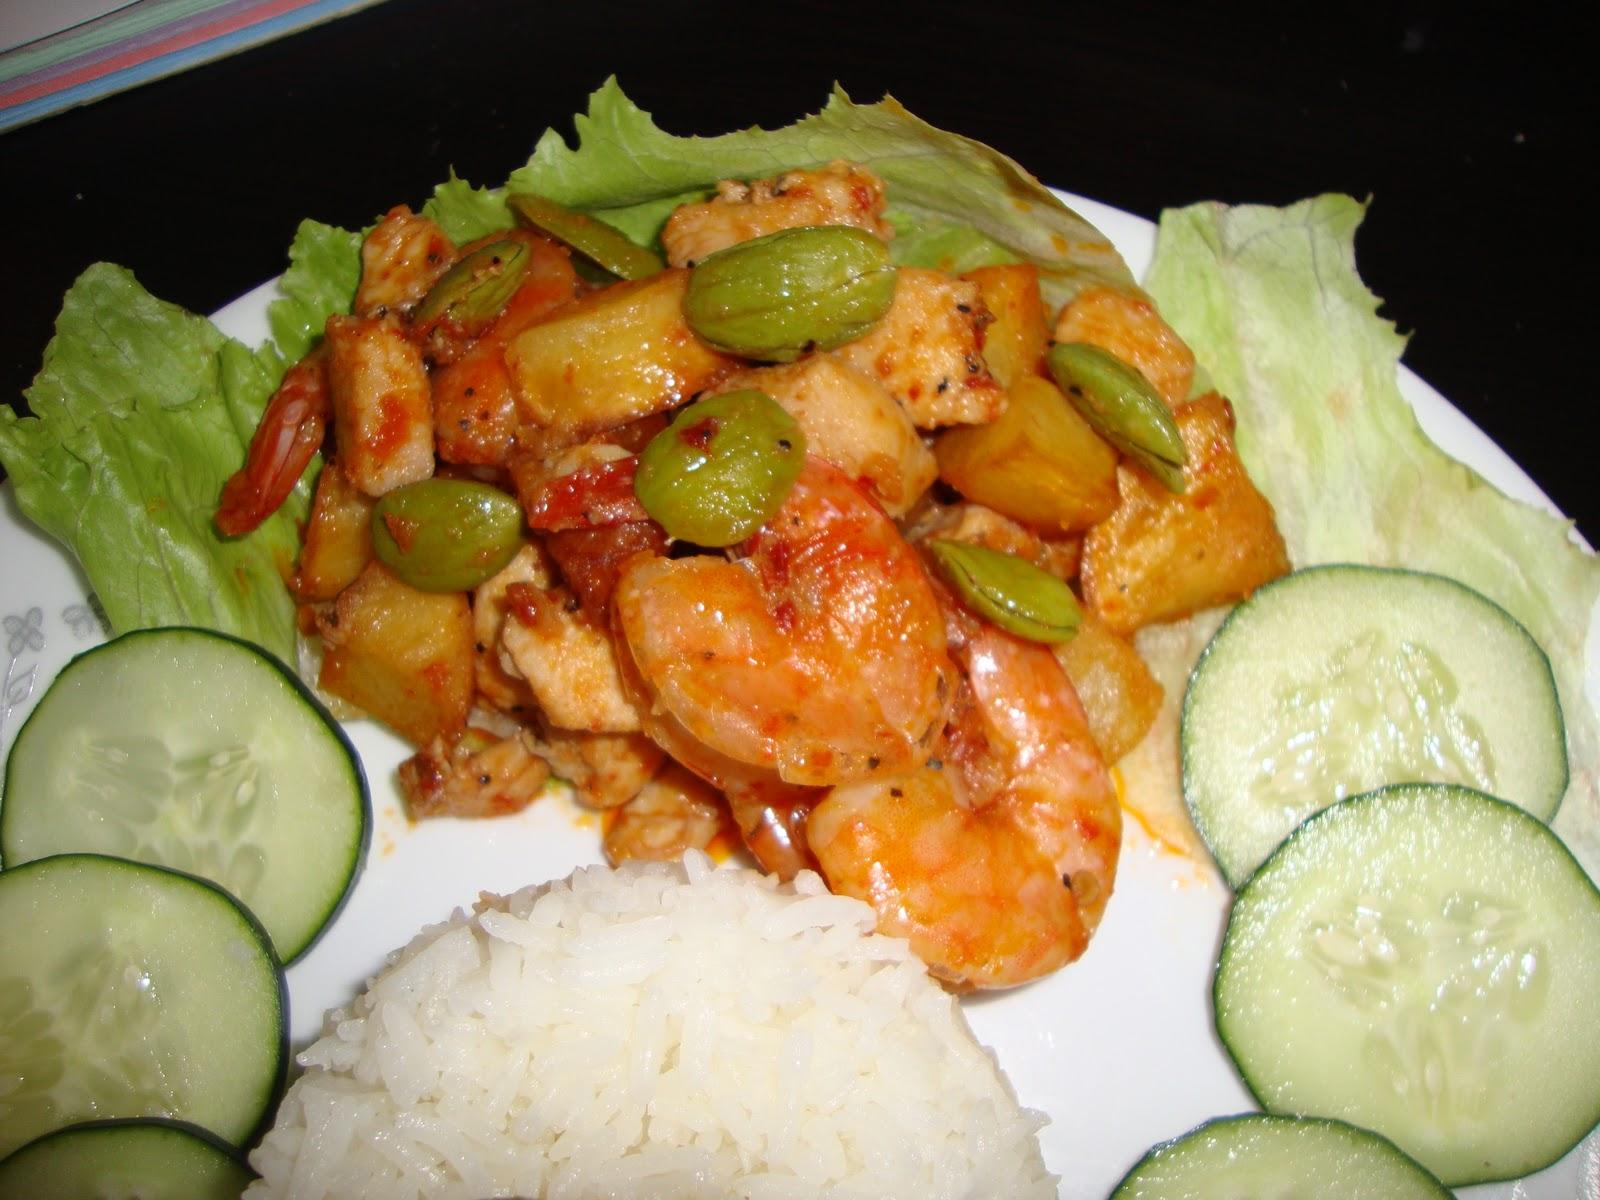 Food and Life: Sambal Udang + Ayam + Kentang +Pete goreng ( Spicy shrimp + Chicken + Potato + Sator)